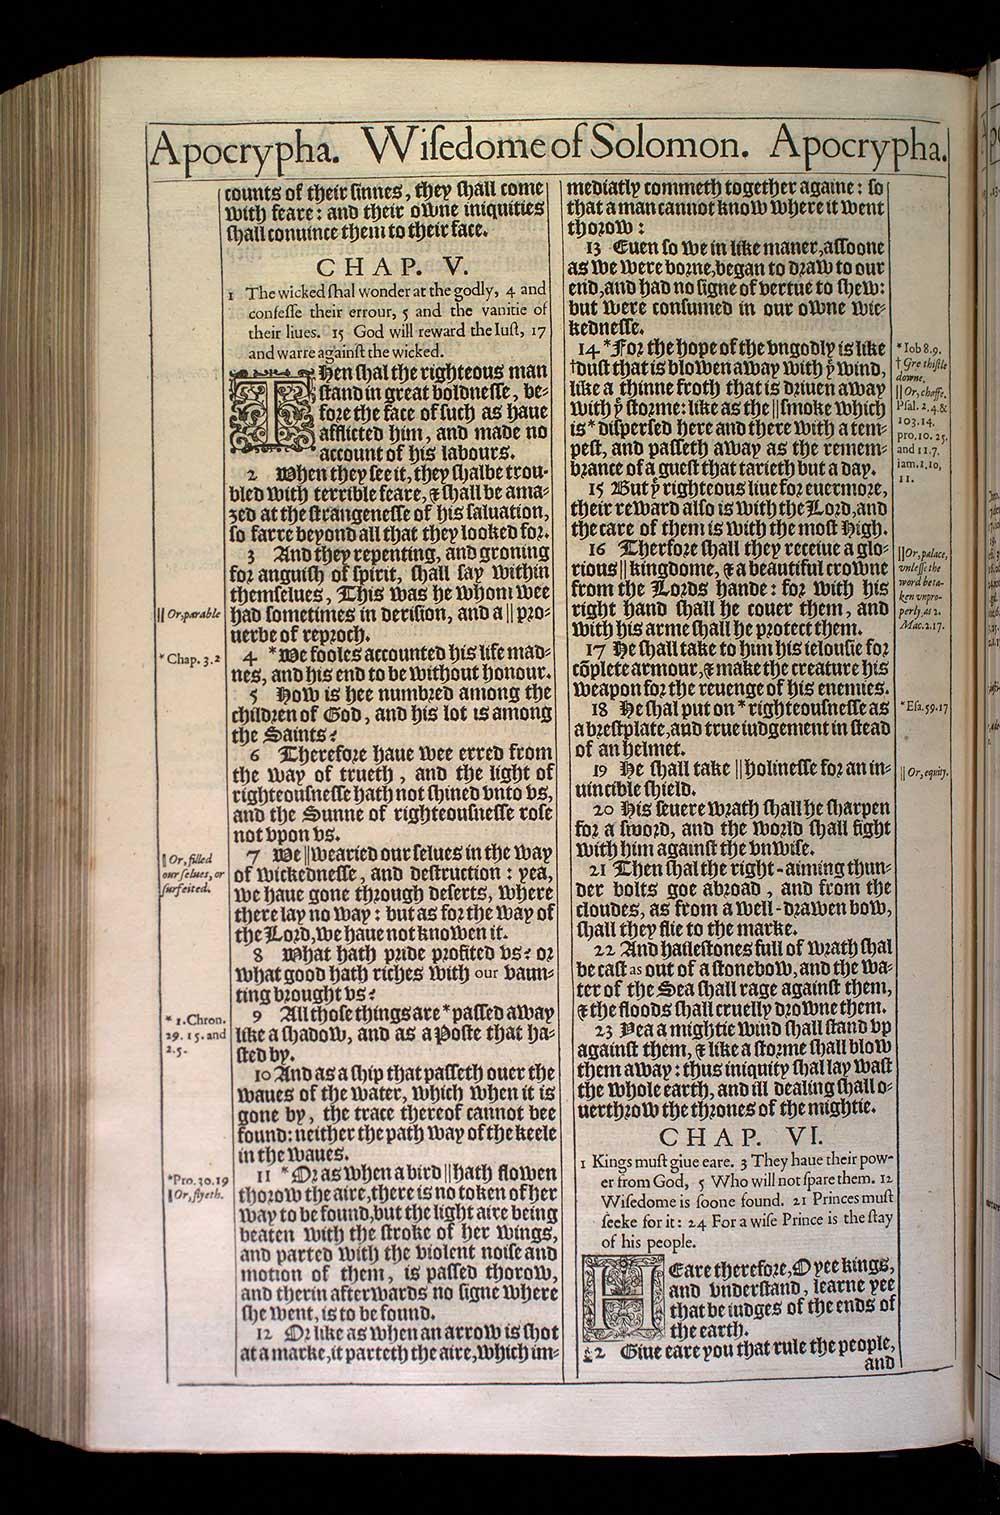 Wisdom of Solomon Chapter 4 Original 1611 Bible Scan